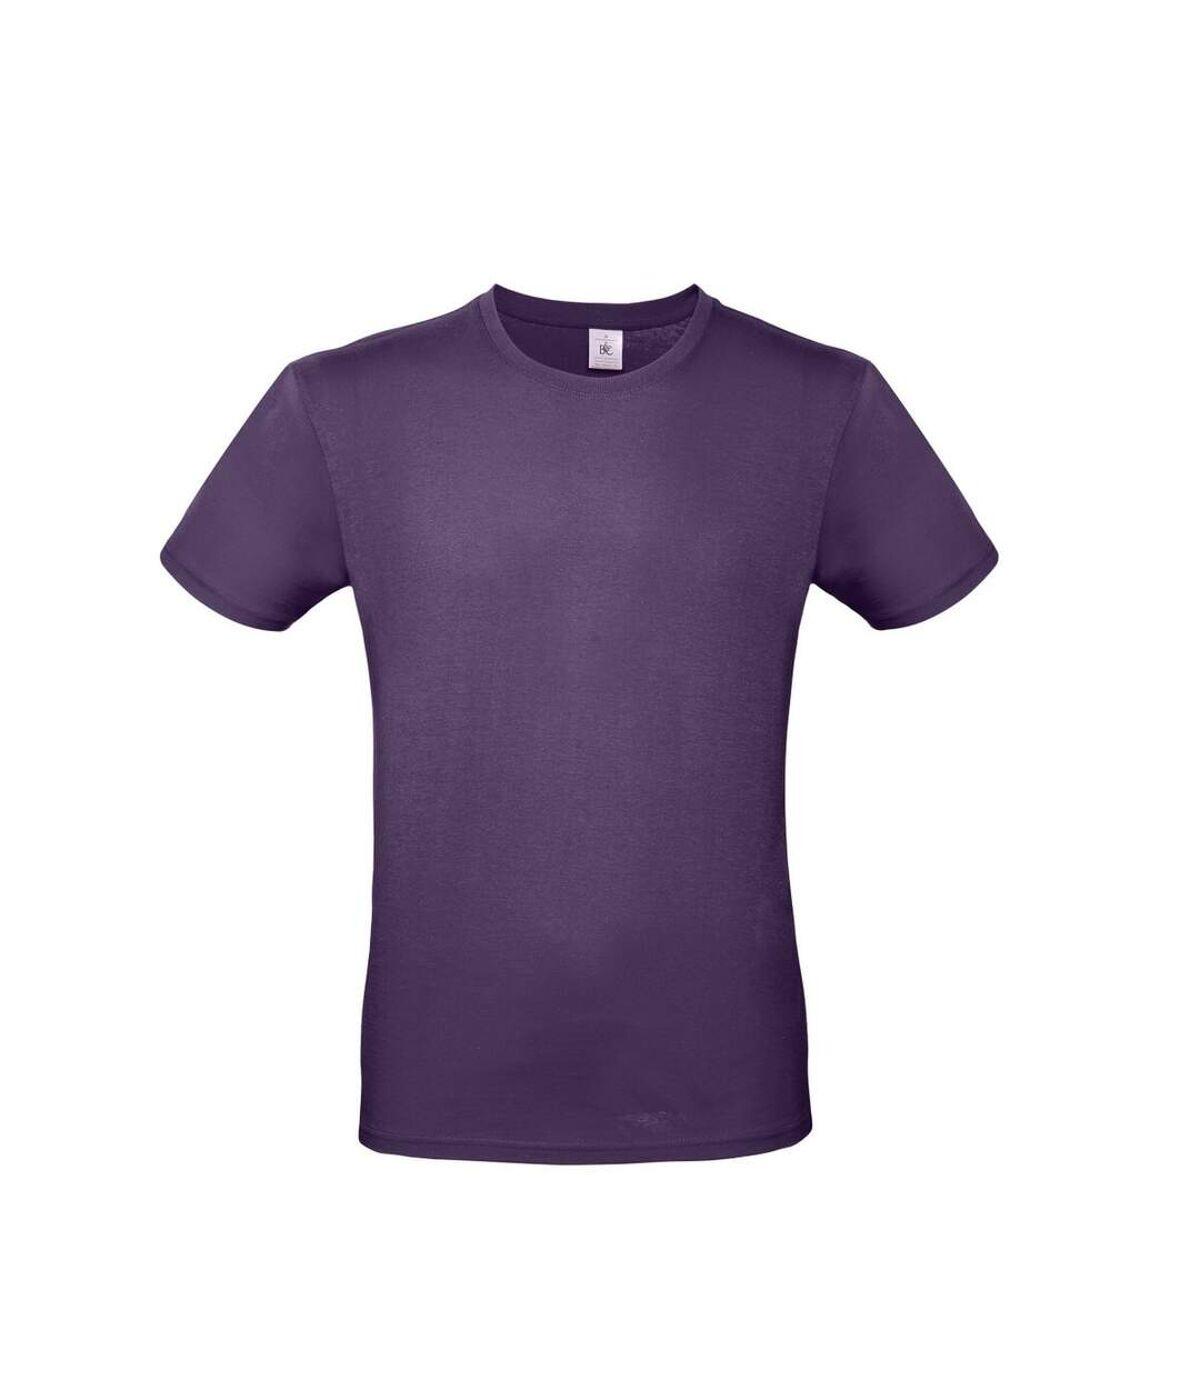 B&C Mens #E150 Tee (Radiant Purple) - UTBC3910